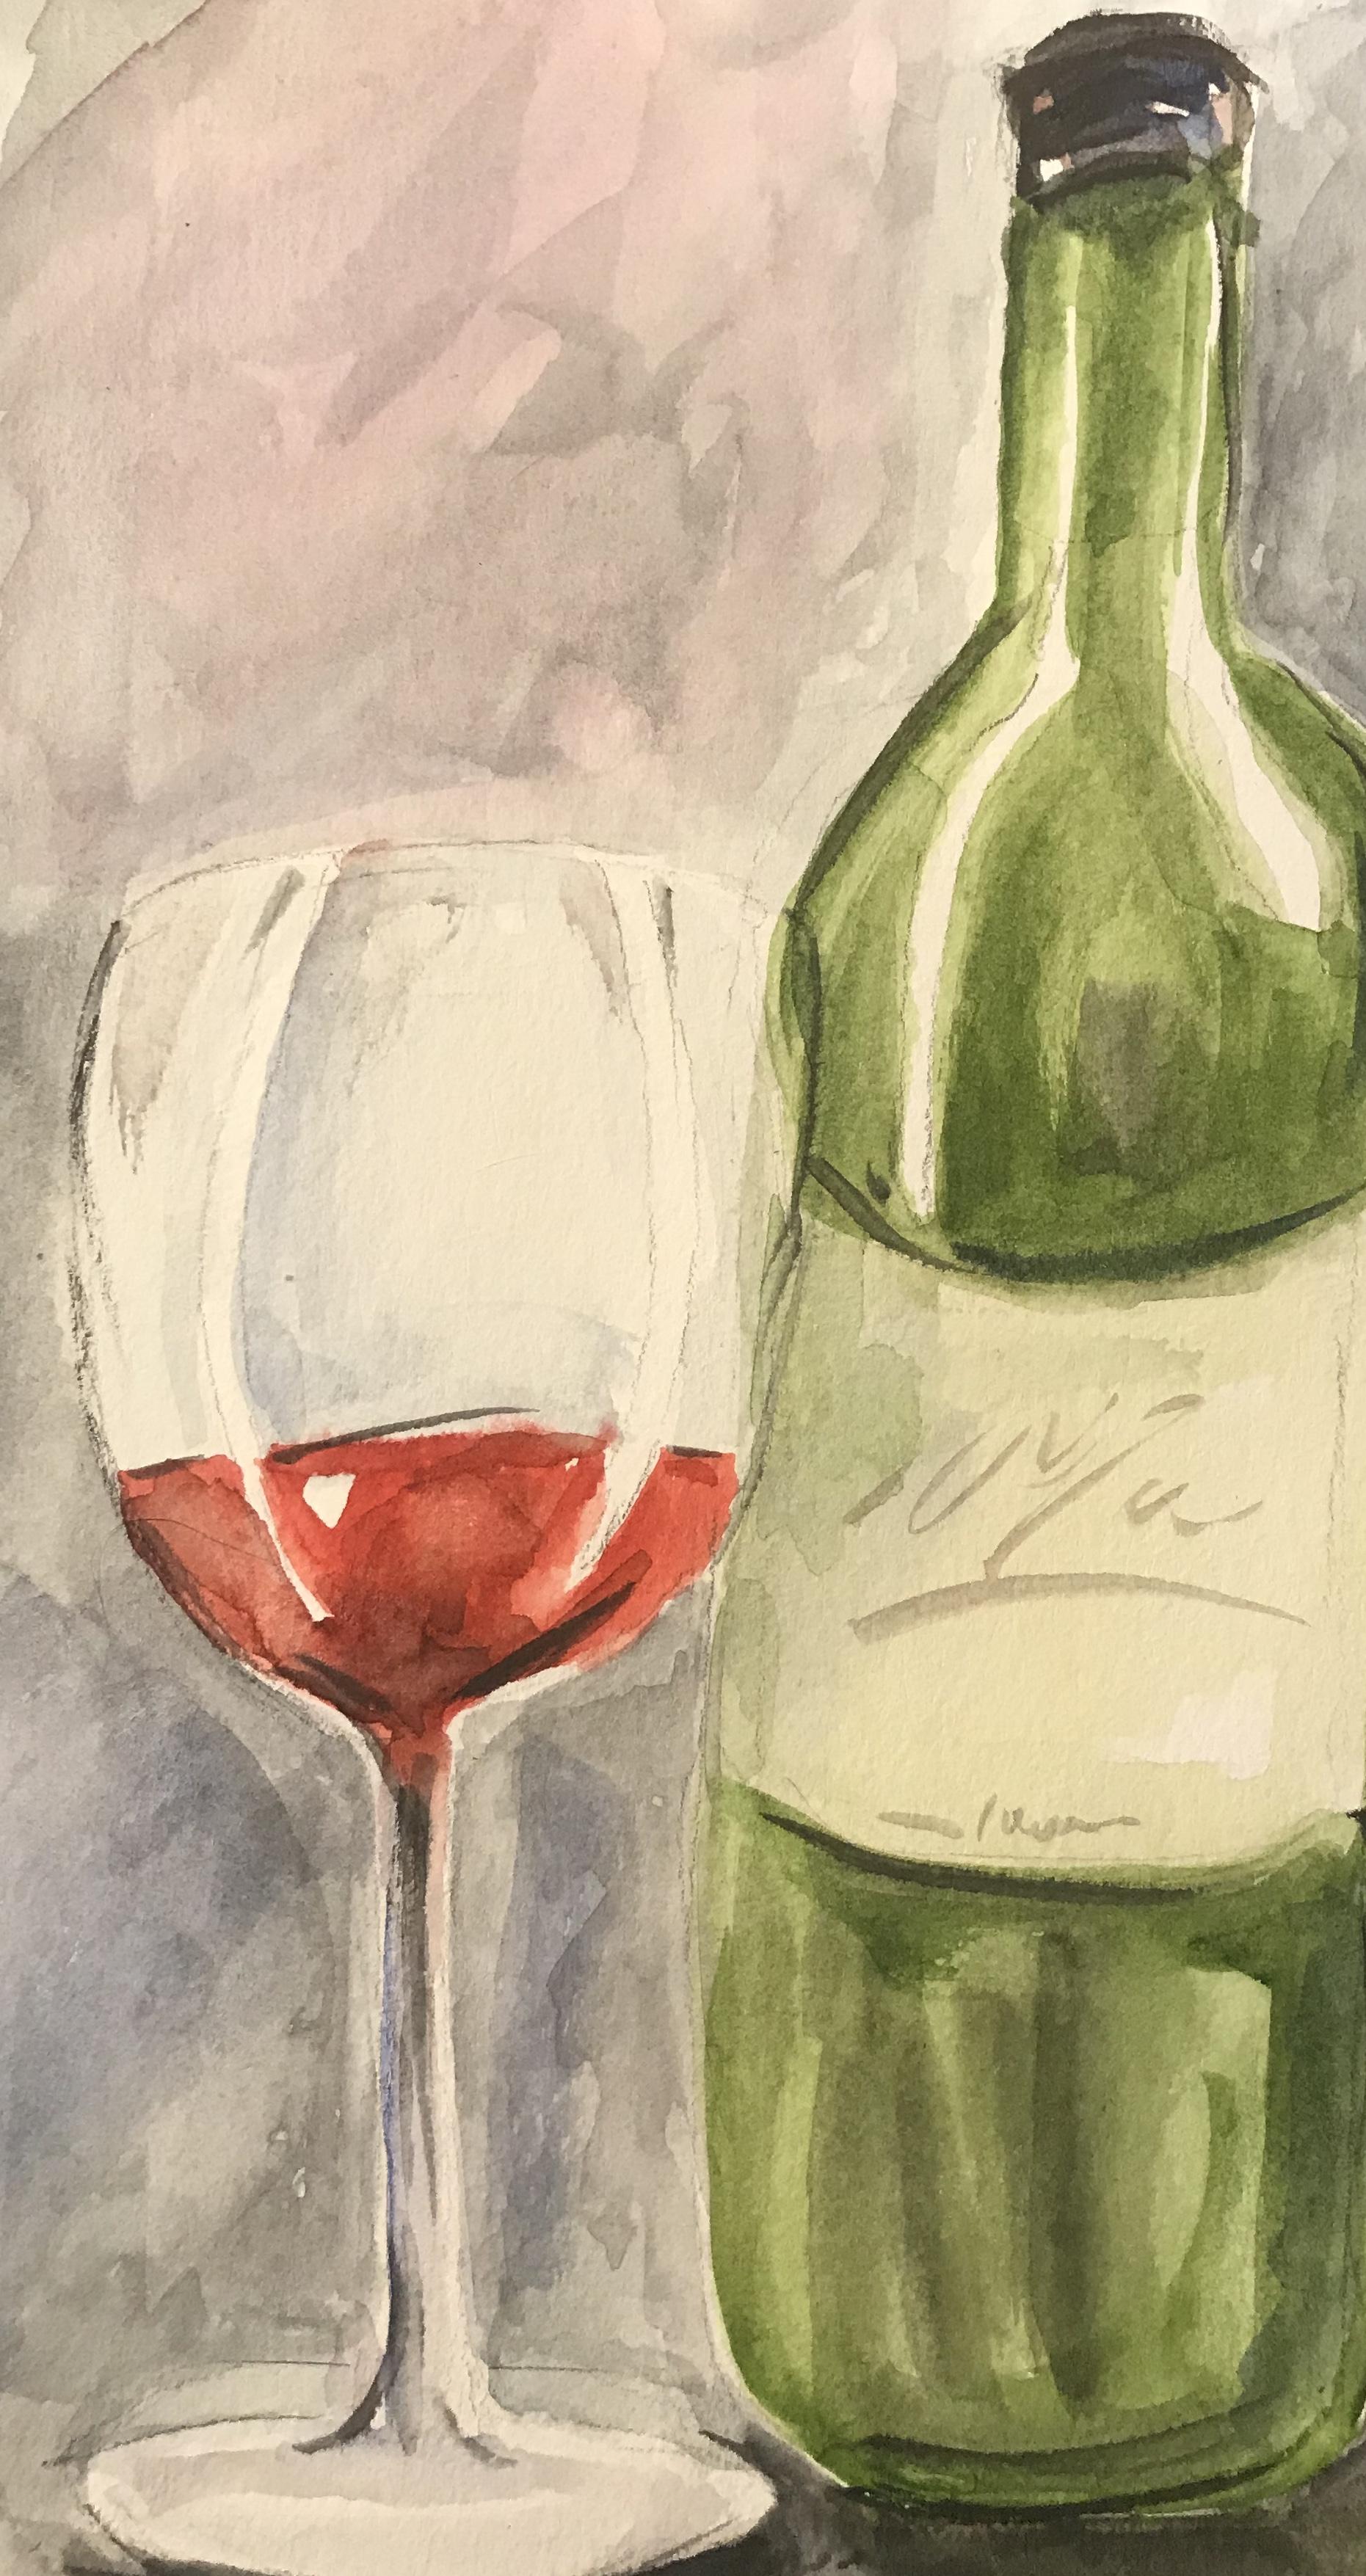 Glass and Wine Bottle.jpg